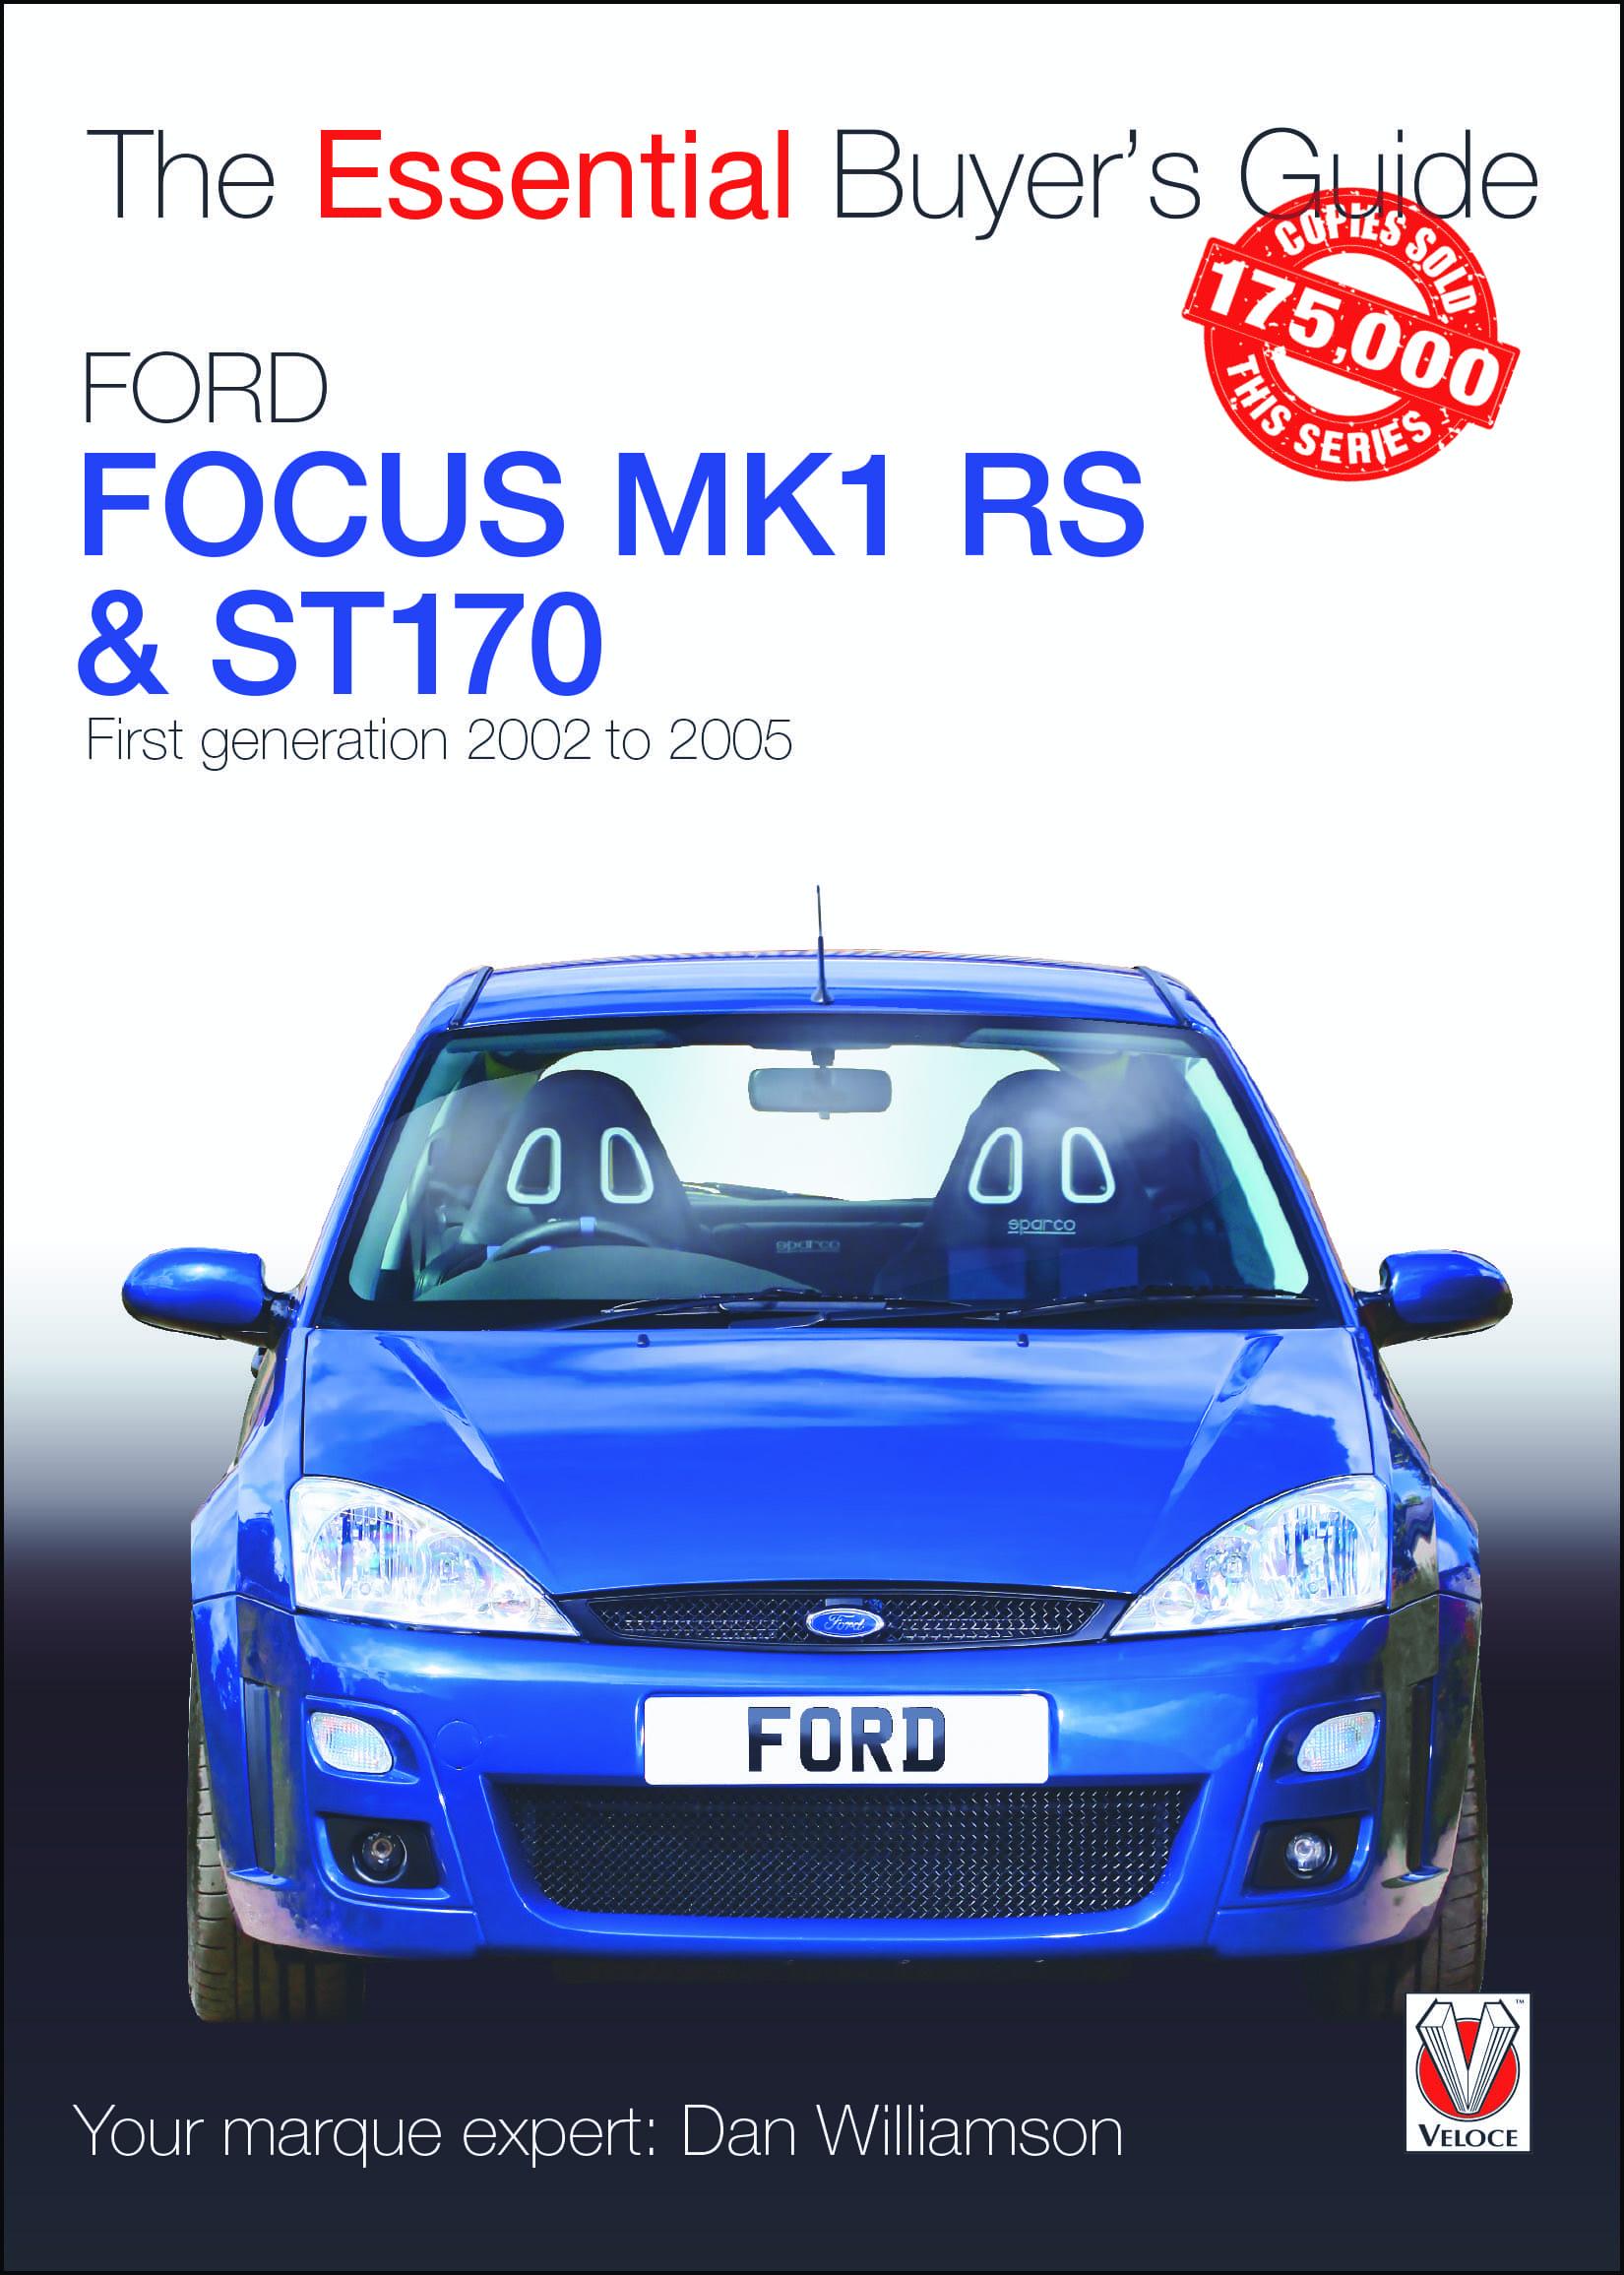 Ford Focus Mk1 RS & ST170 EBG  cover